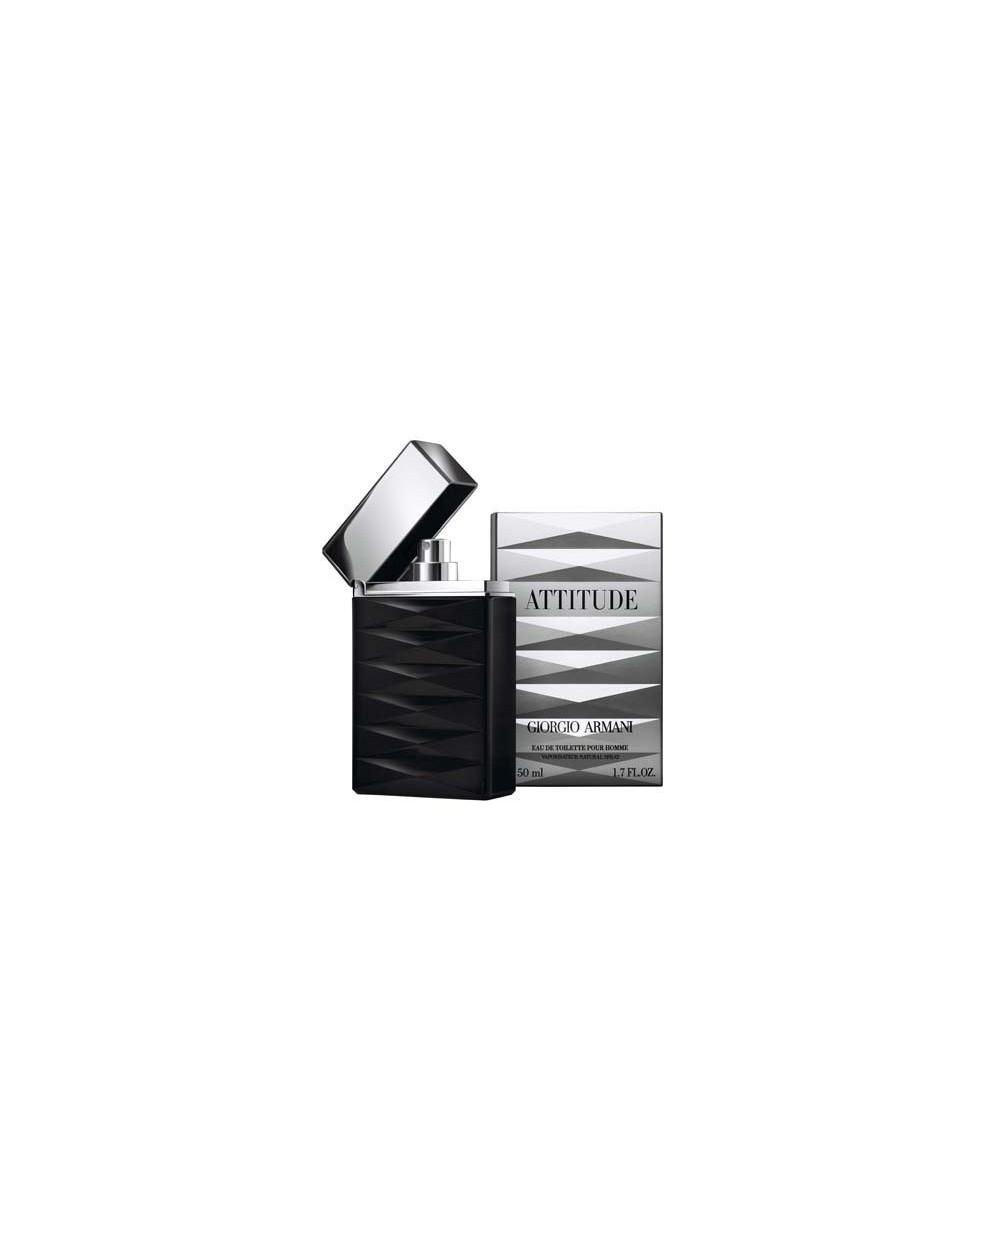 Armani Attitude Eau De Toilette 50ml Sovrana Parfums